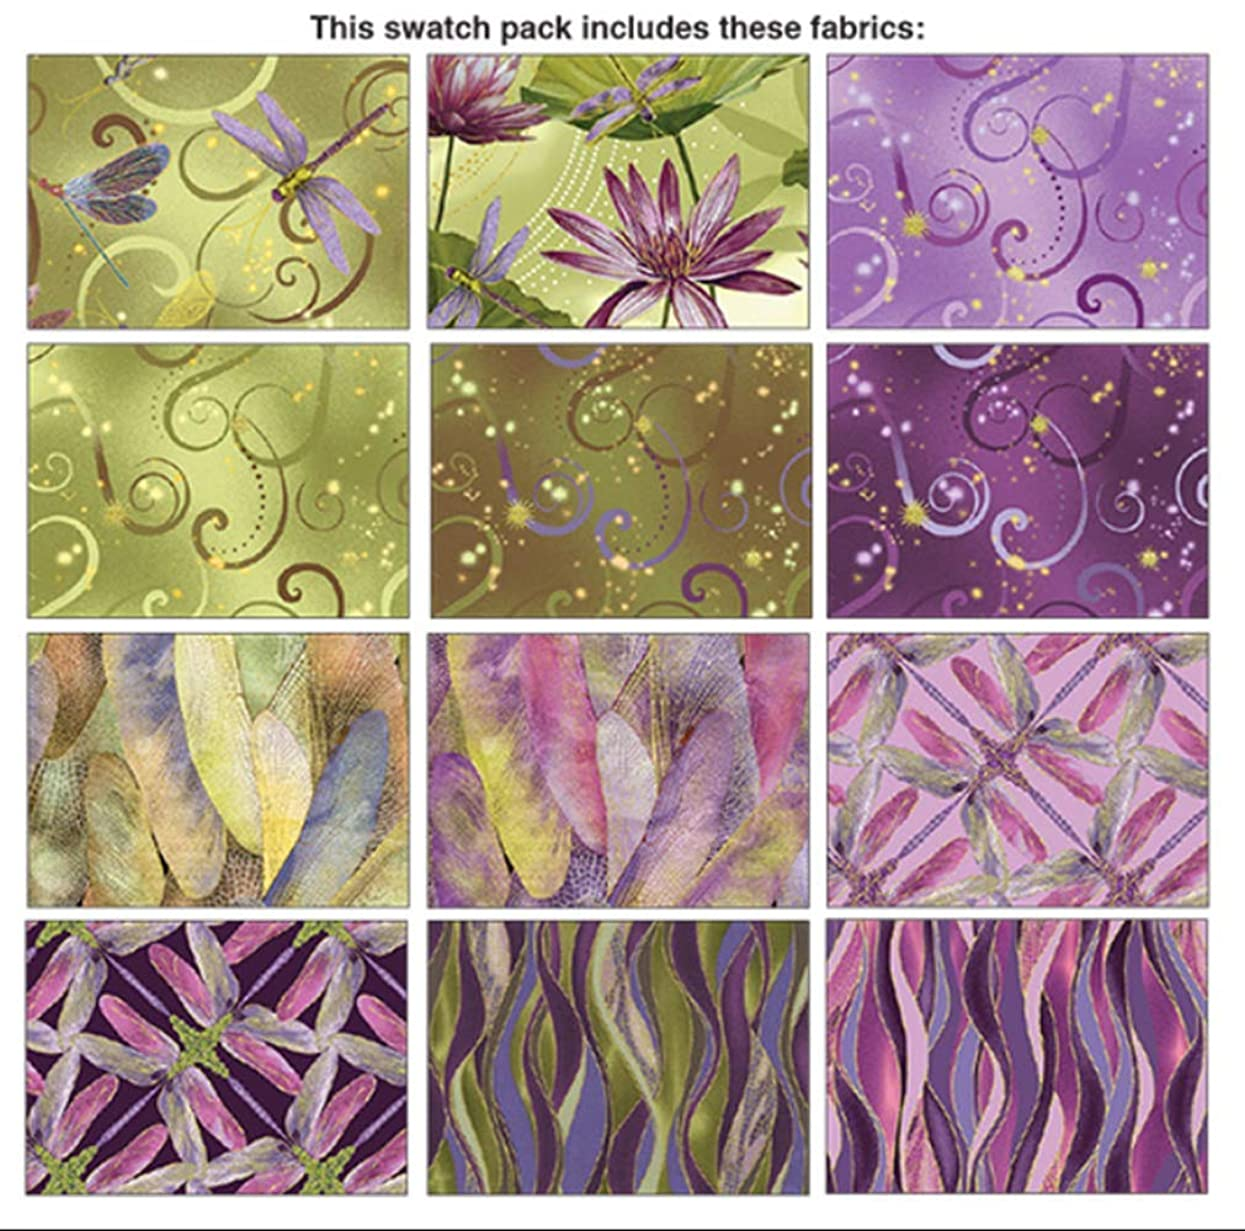 Benartex DANCE OF THE DRAGONFLY 12 Fat Quarters Cotton Fabric Quilting Assortment(Purple)